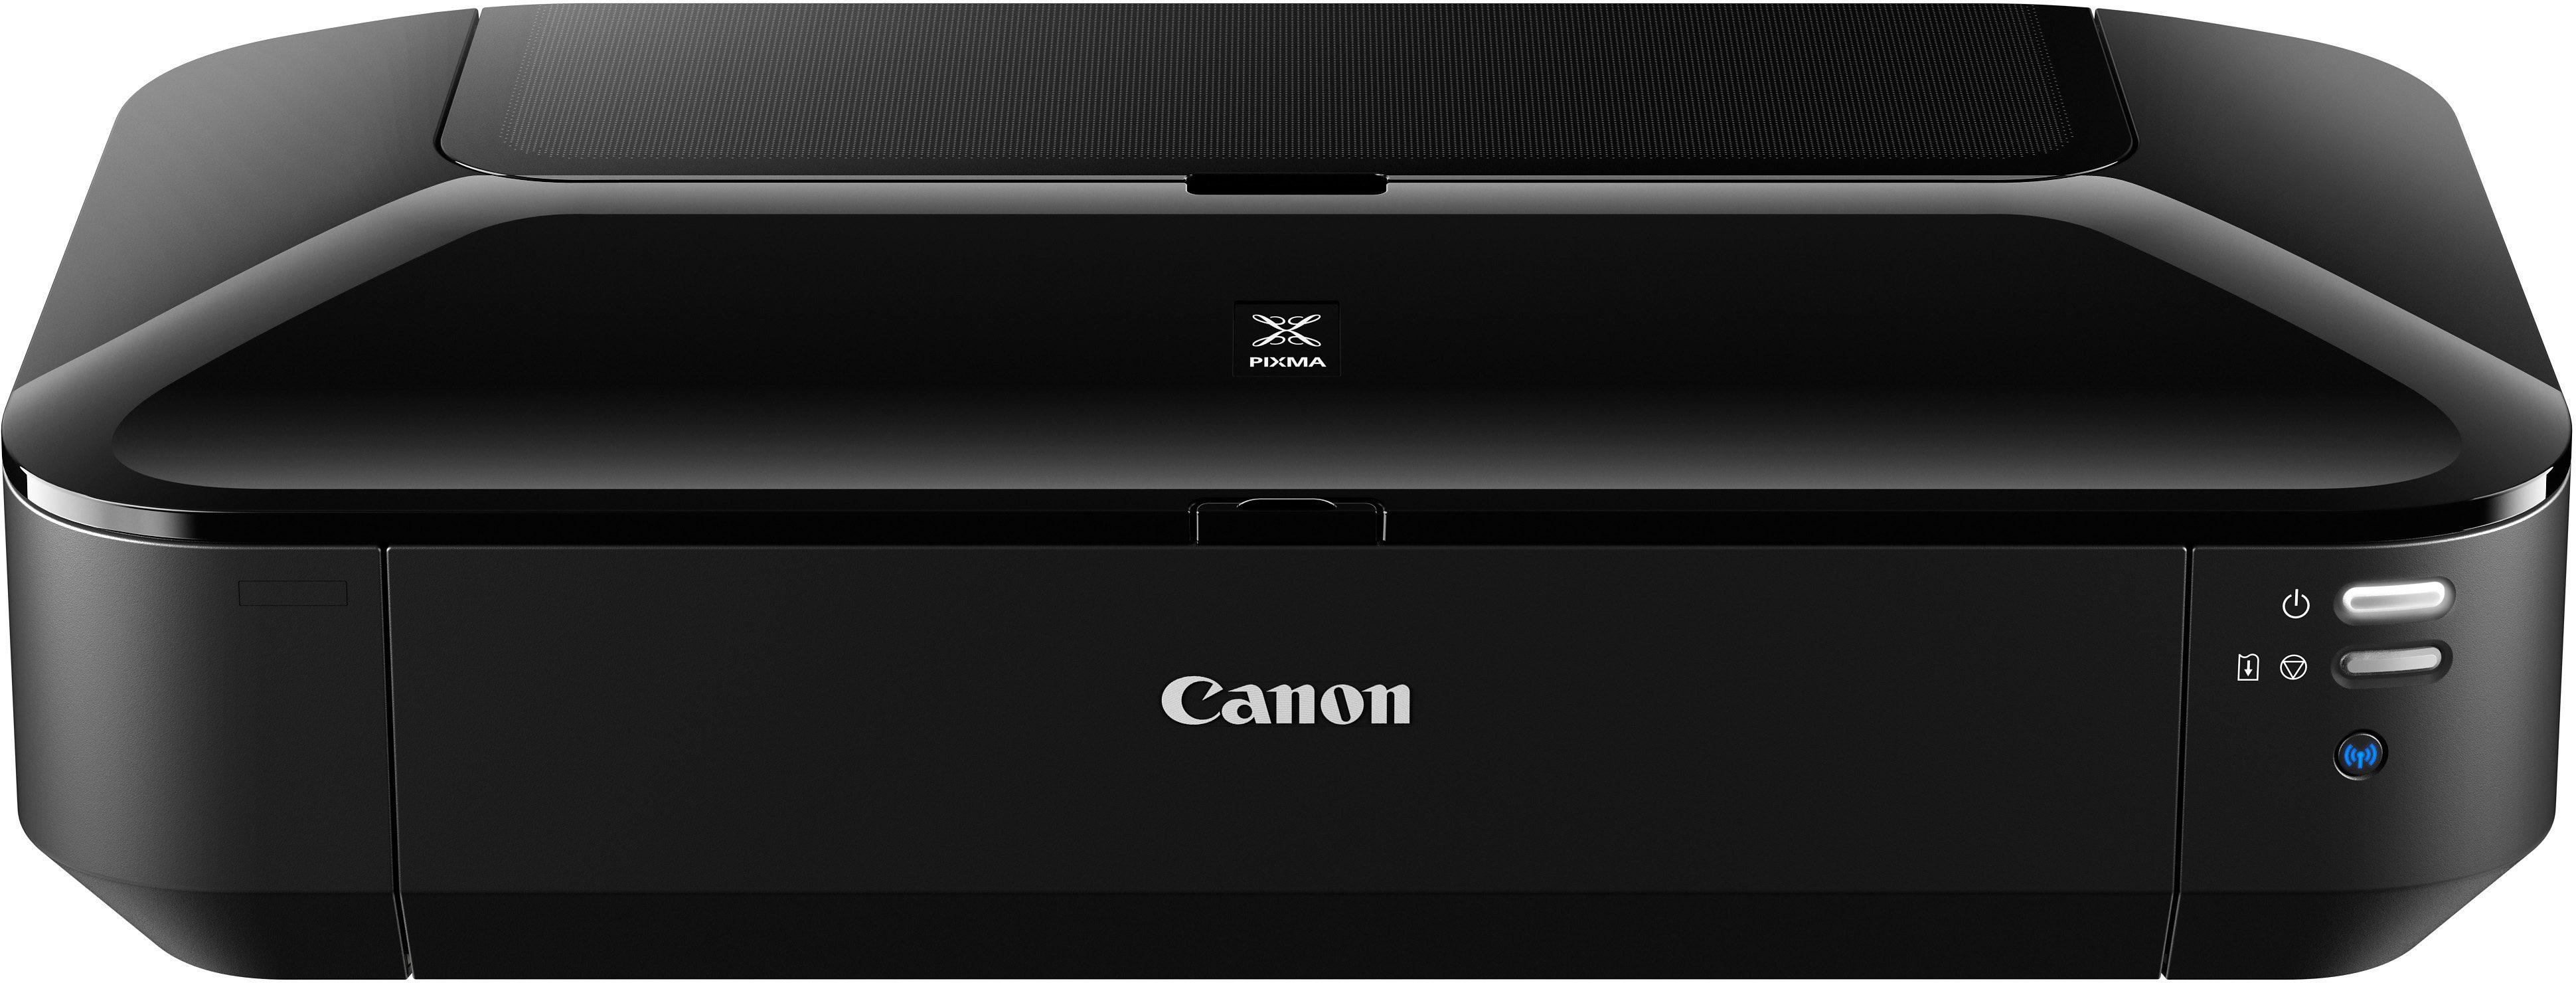 Canon PIXMA iX6850 Drucker